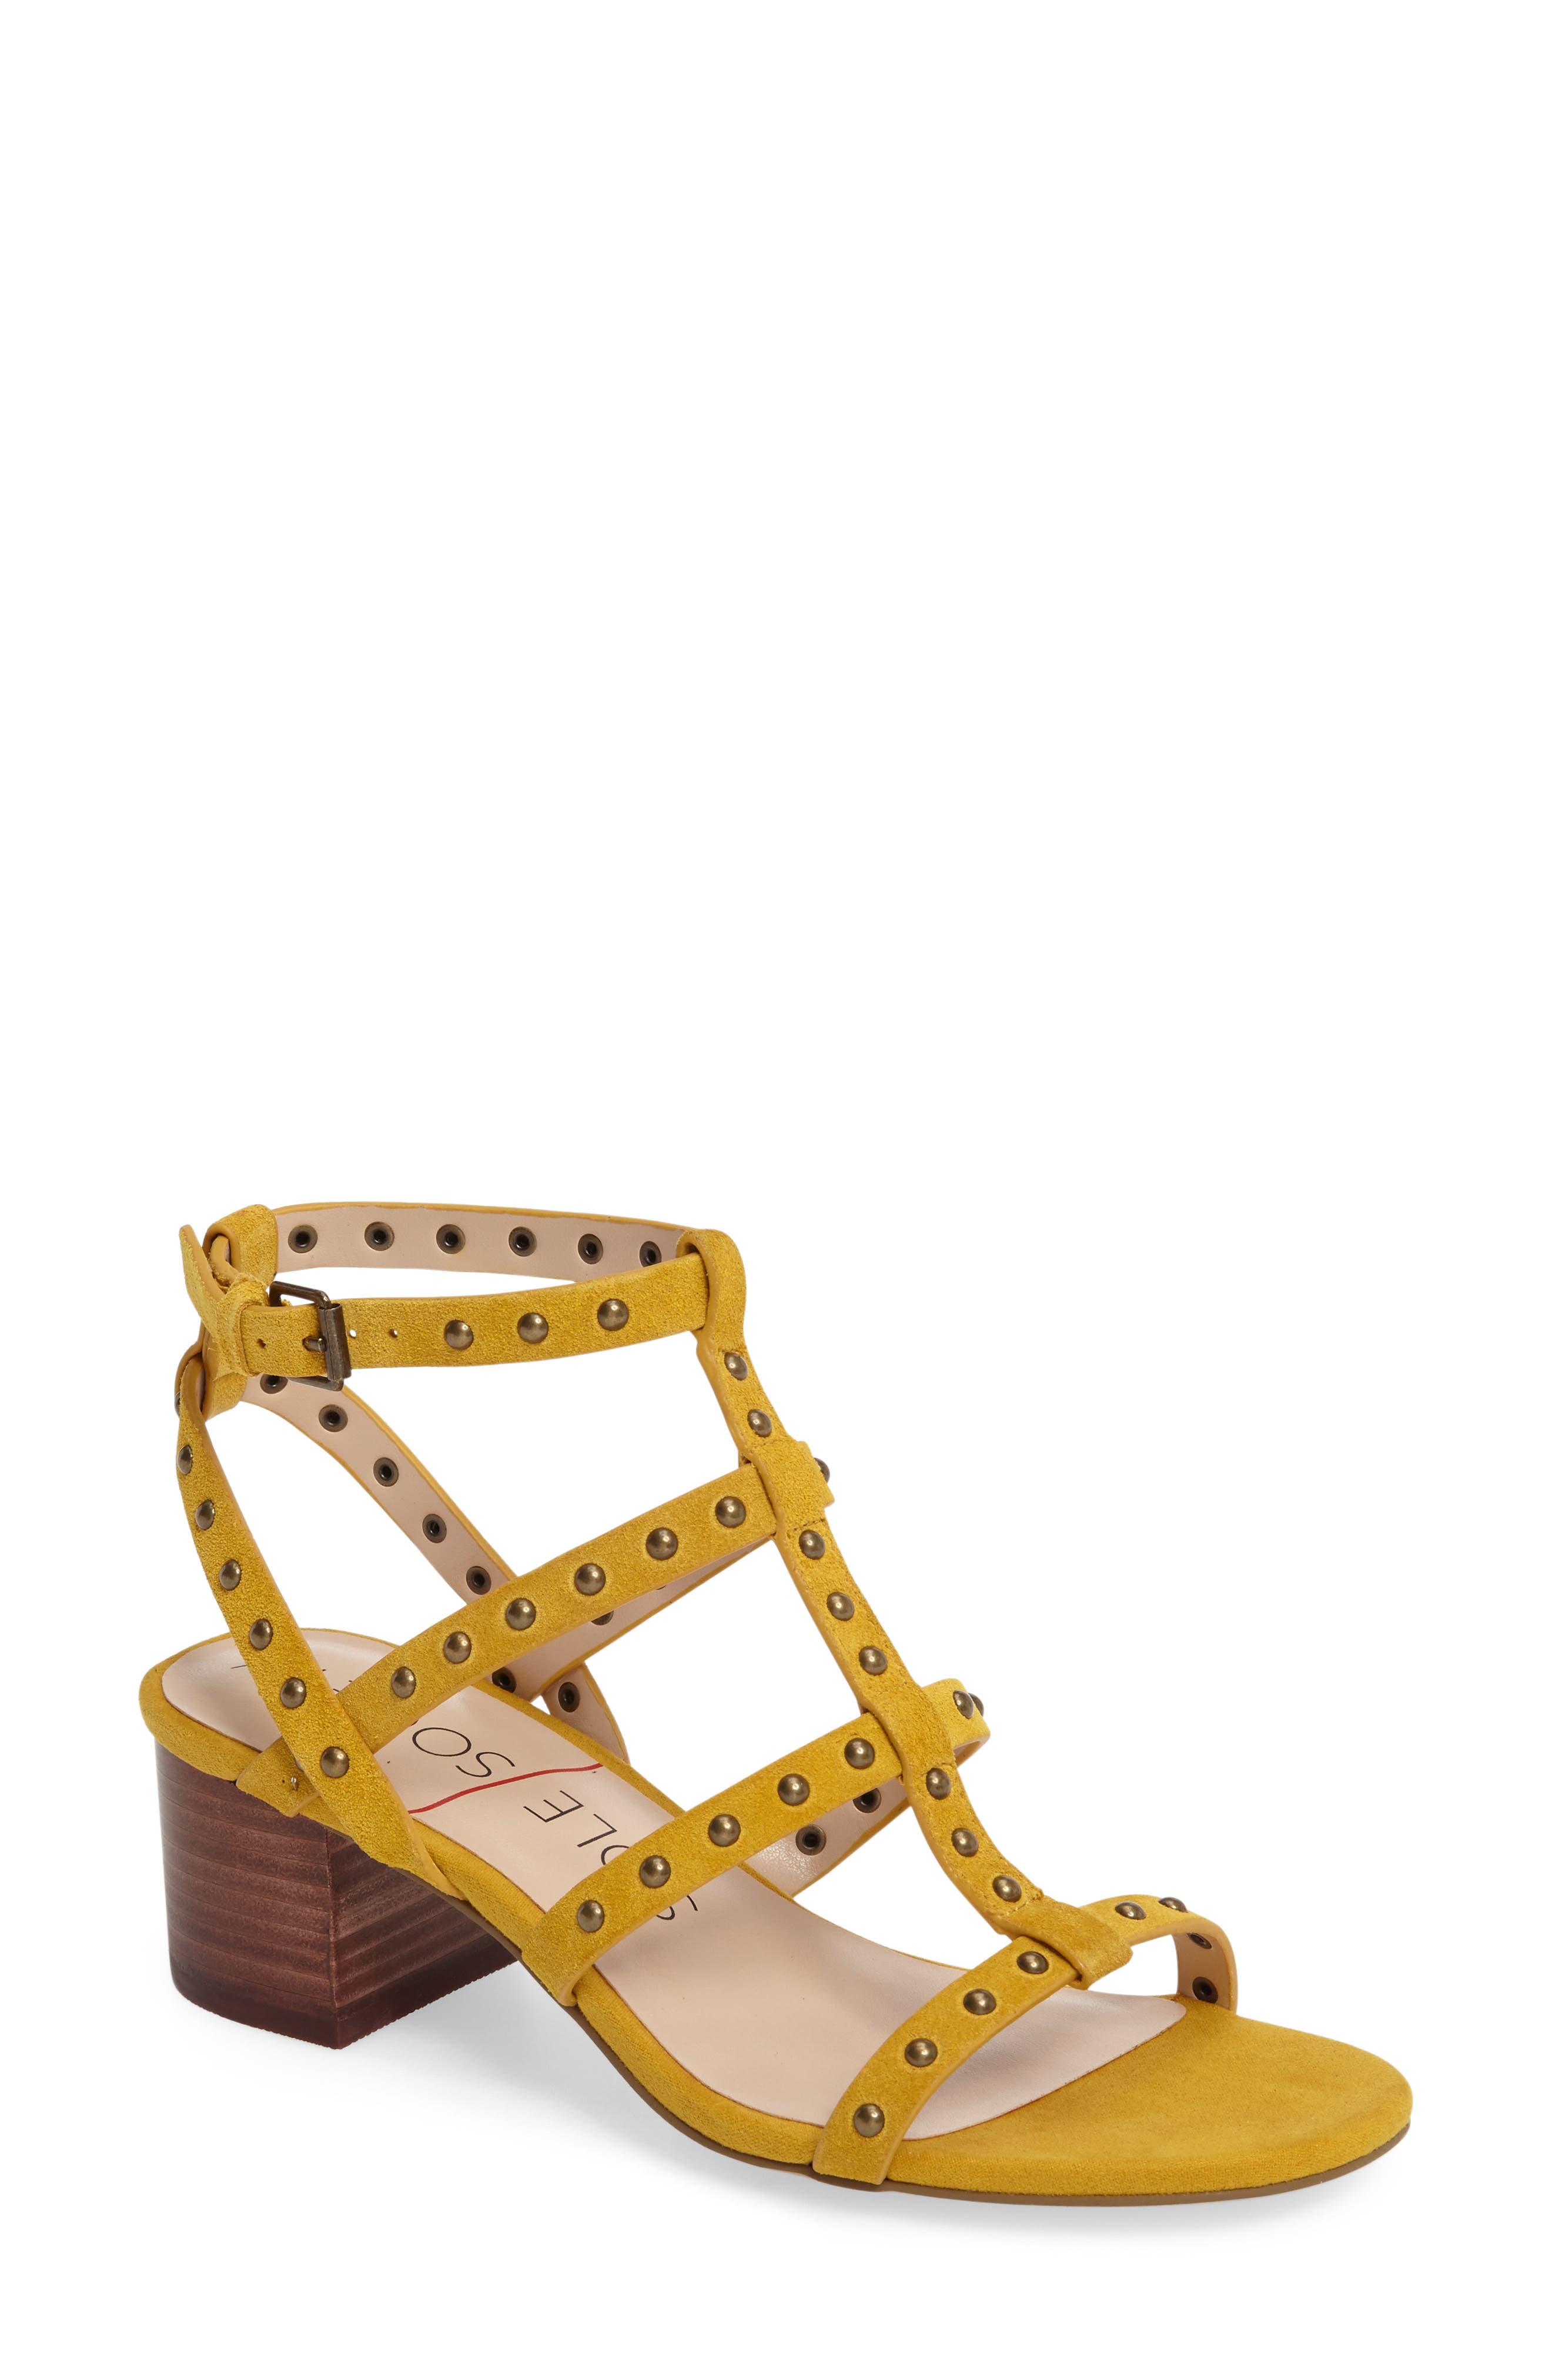 SOLE SOCIETY Phoenix Sandal